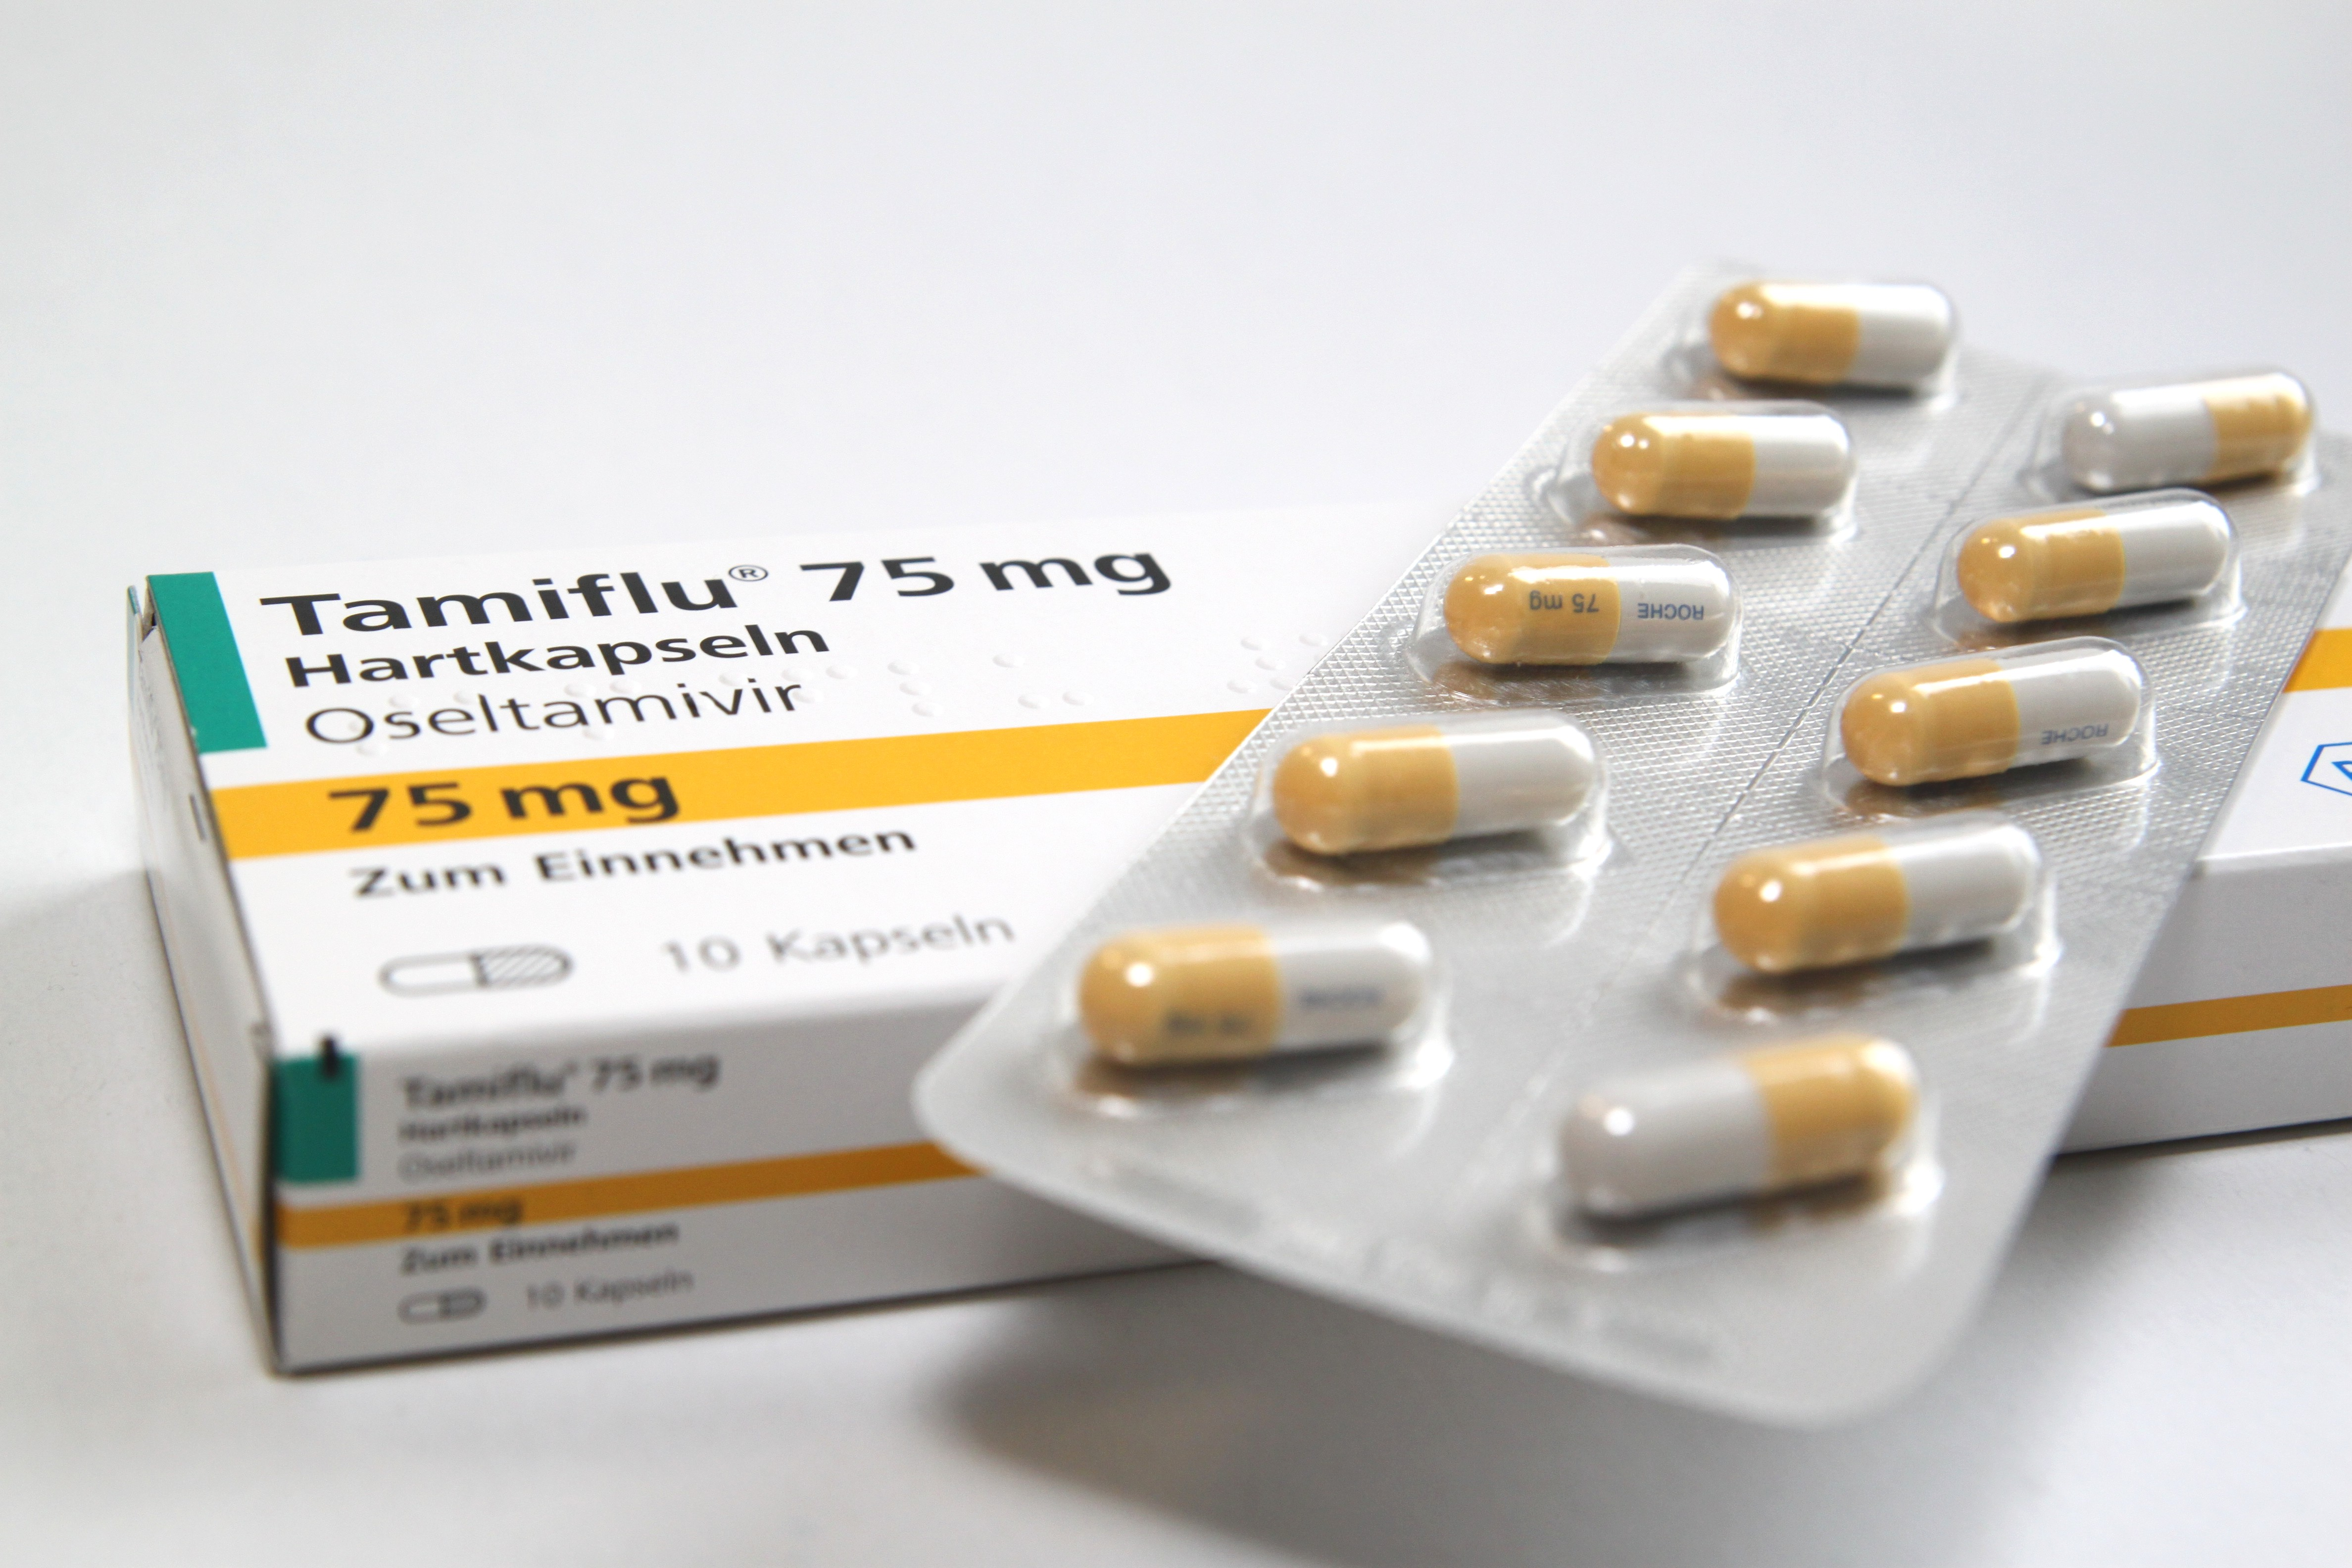 Tamiflu 75